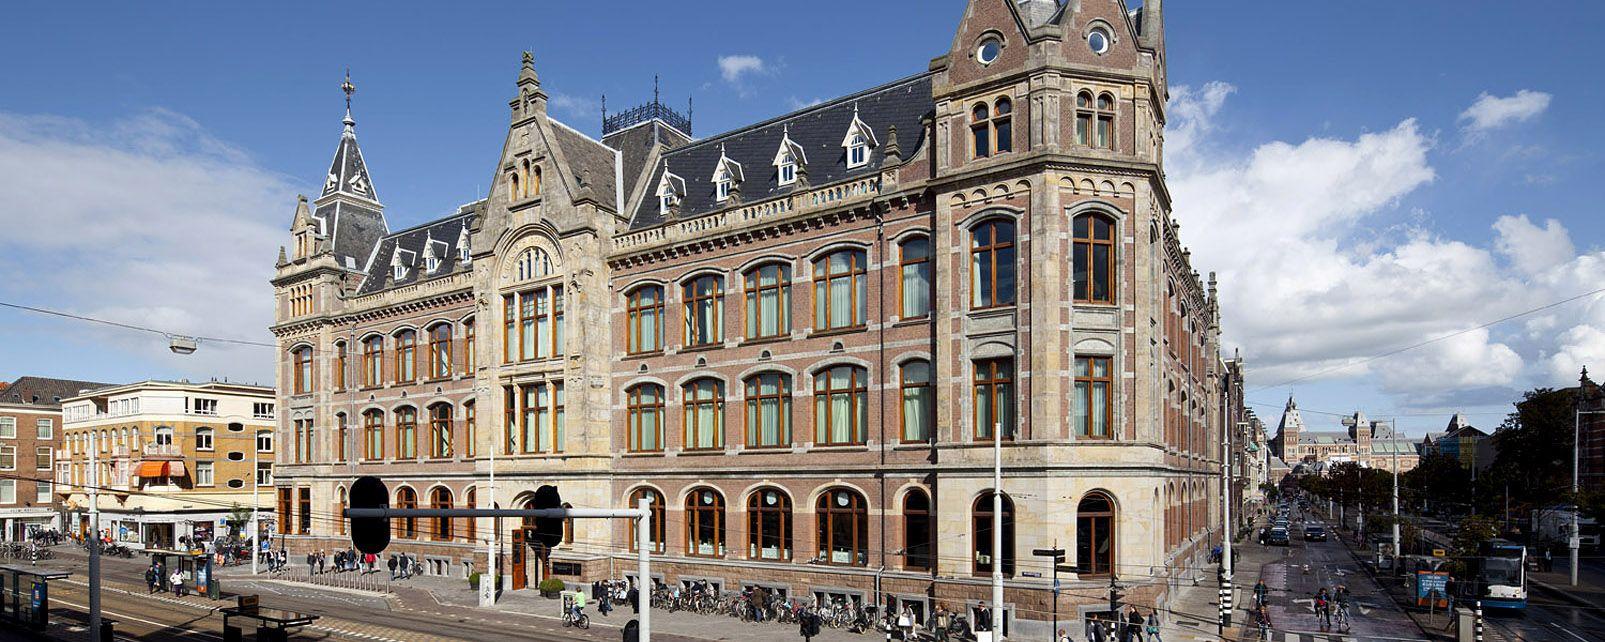 Hôtel Conservatorium Hotel Amsterdam